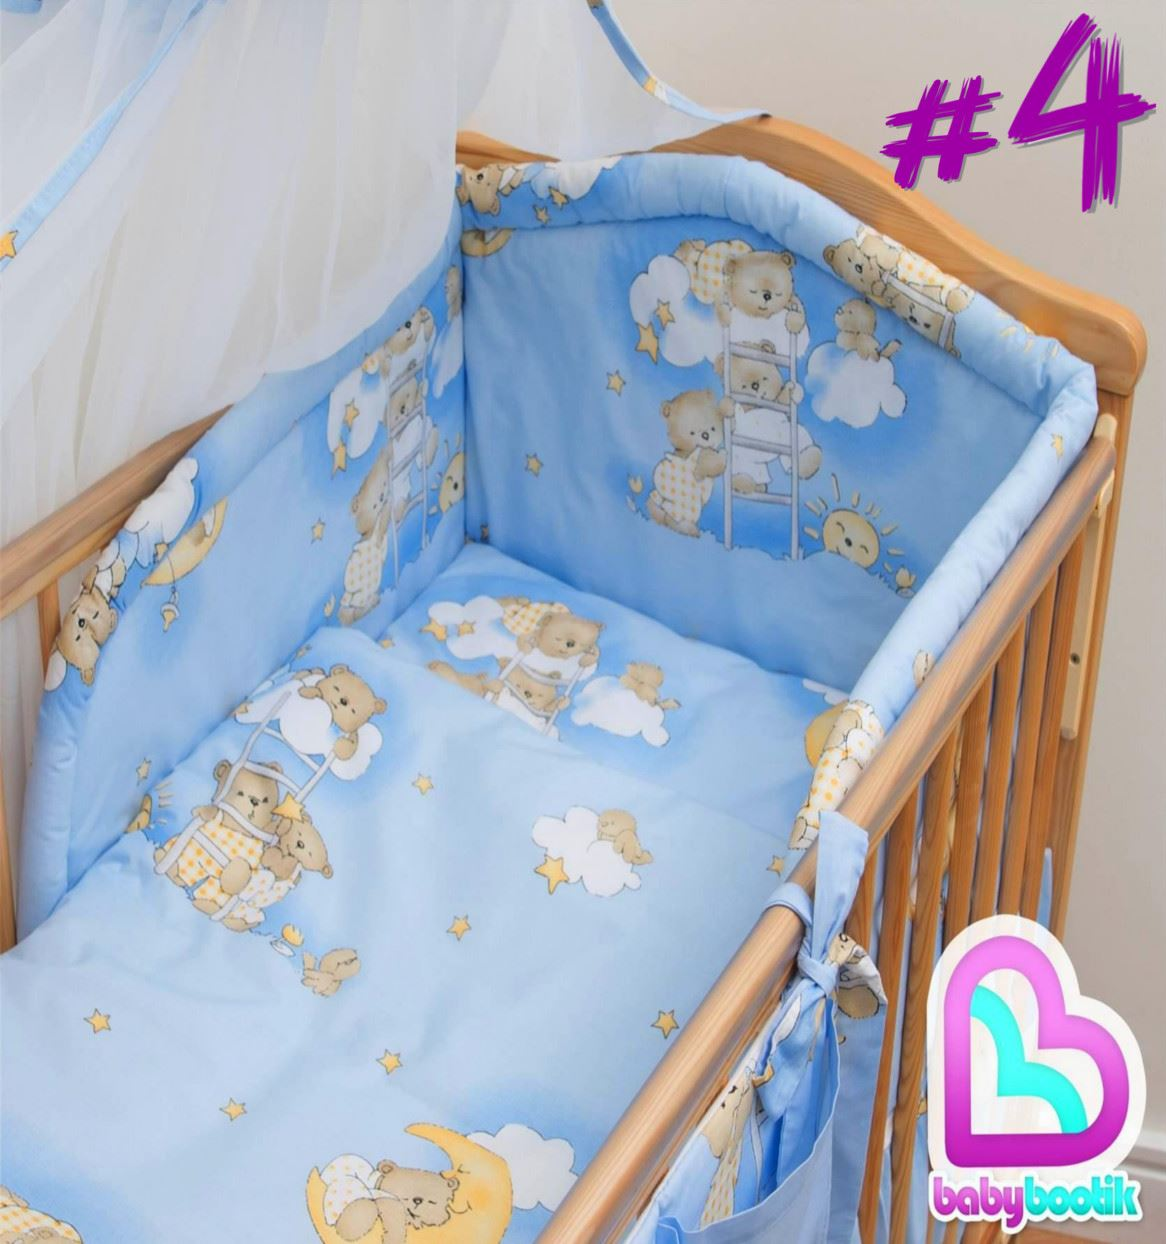 NURSERY COT /& COT BED BEDDING SET 3 PCS 6 10 PIECE SHEET DUVET BUMPER CANOPY